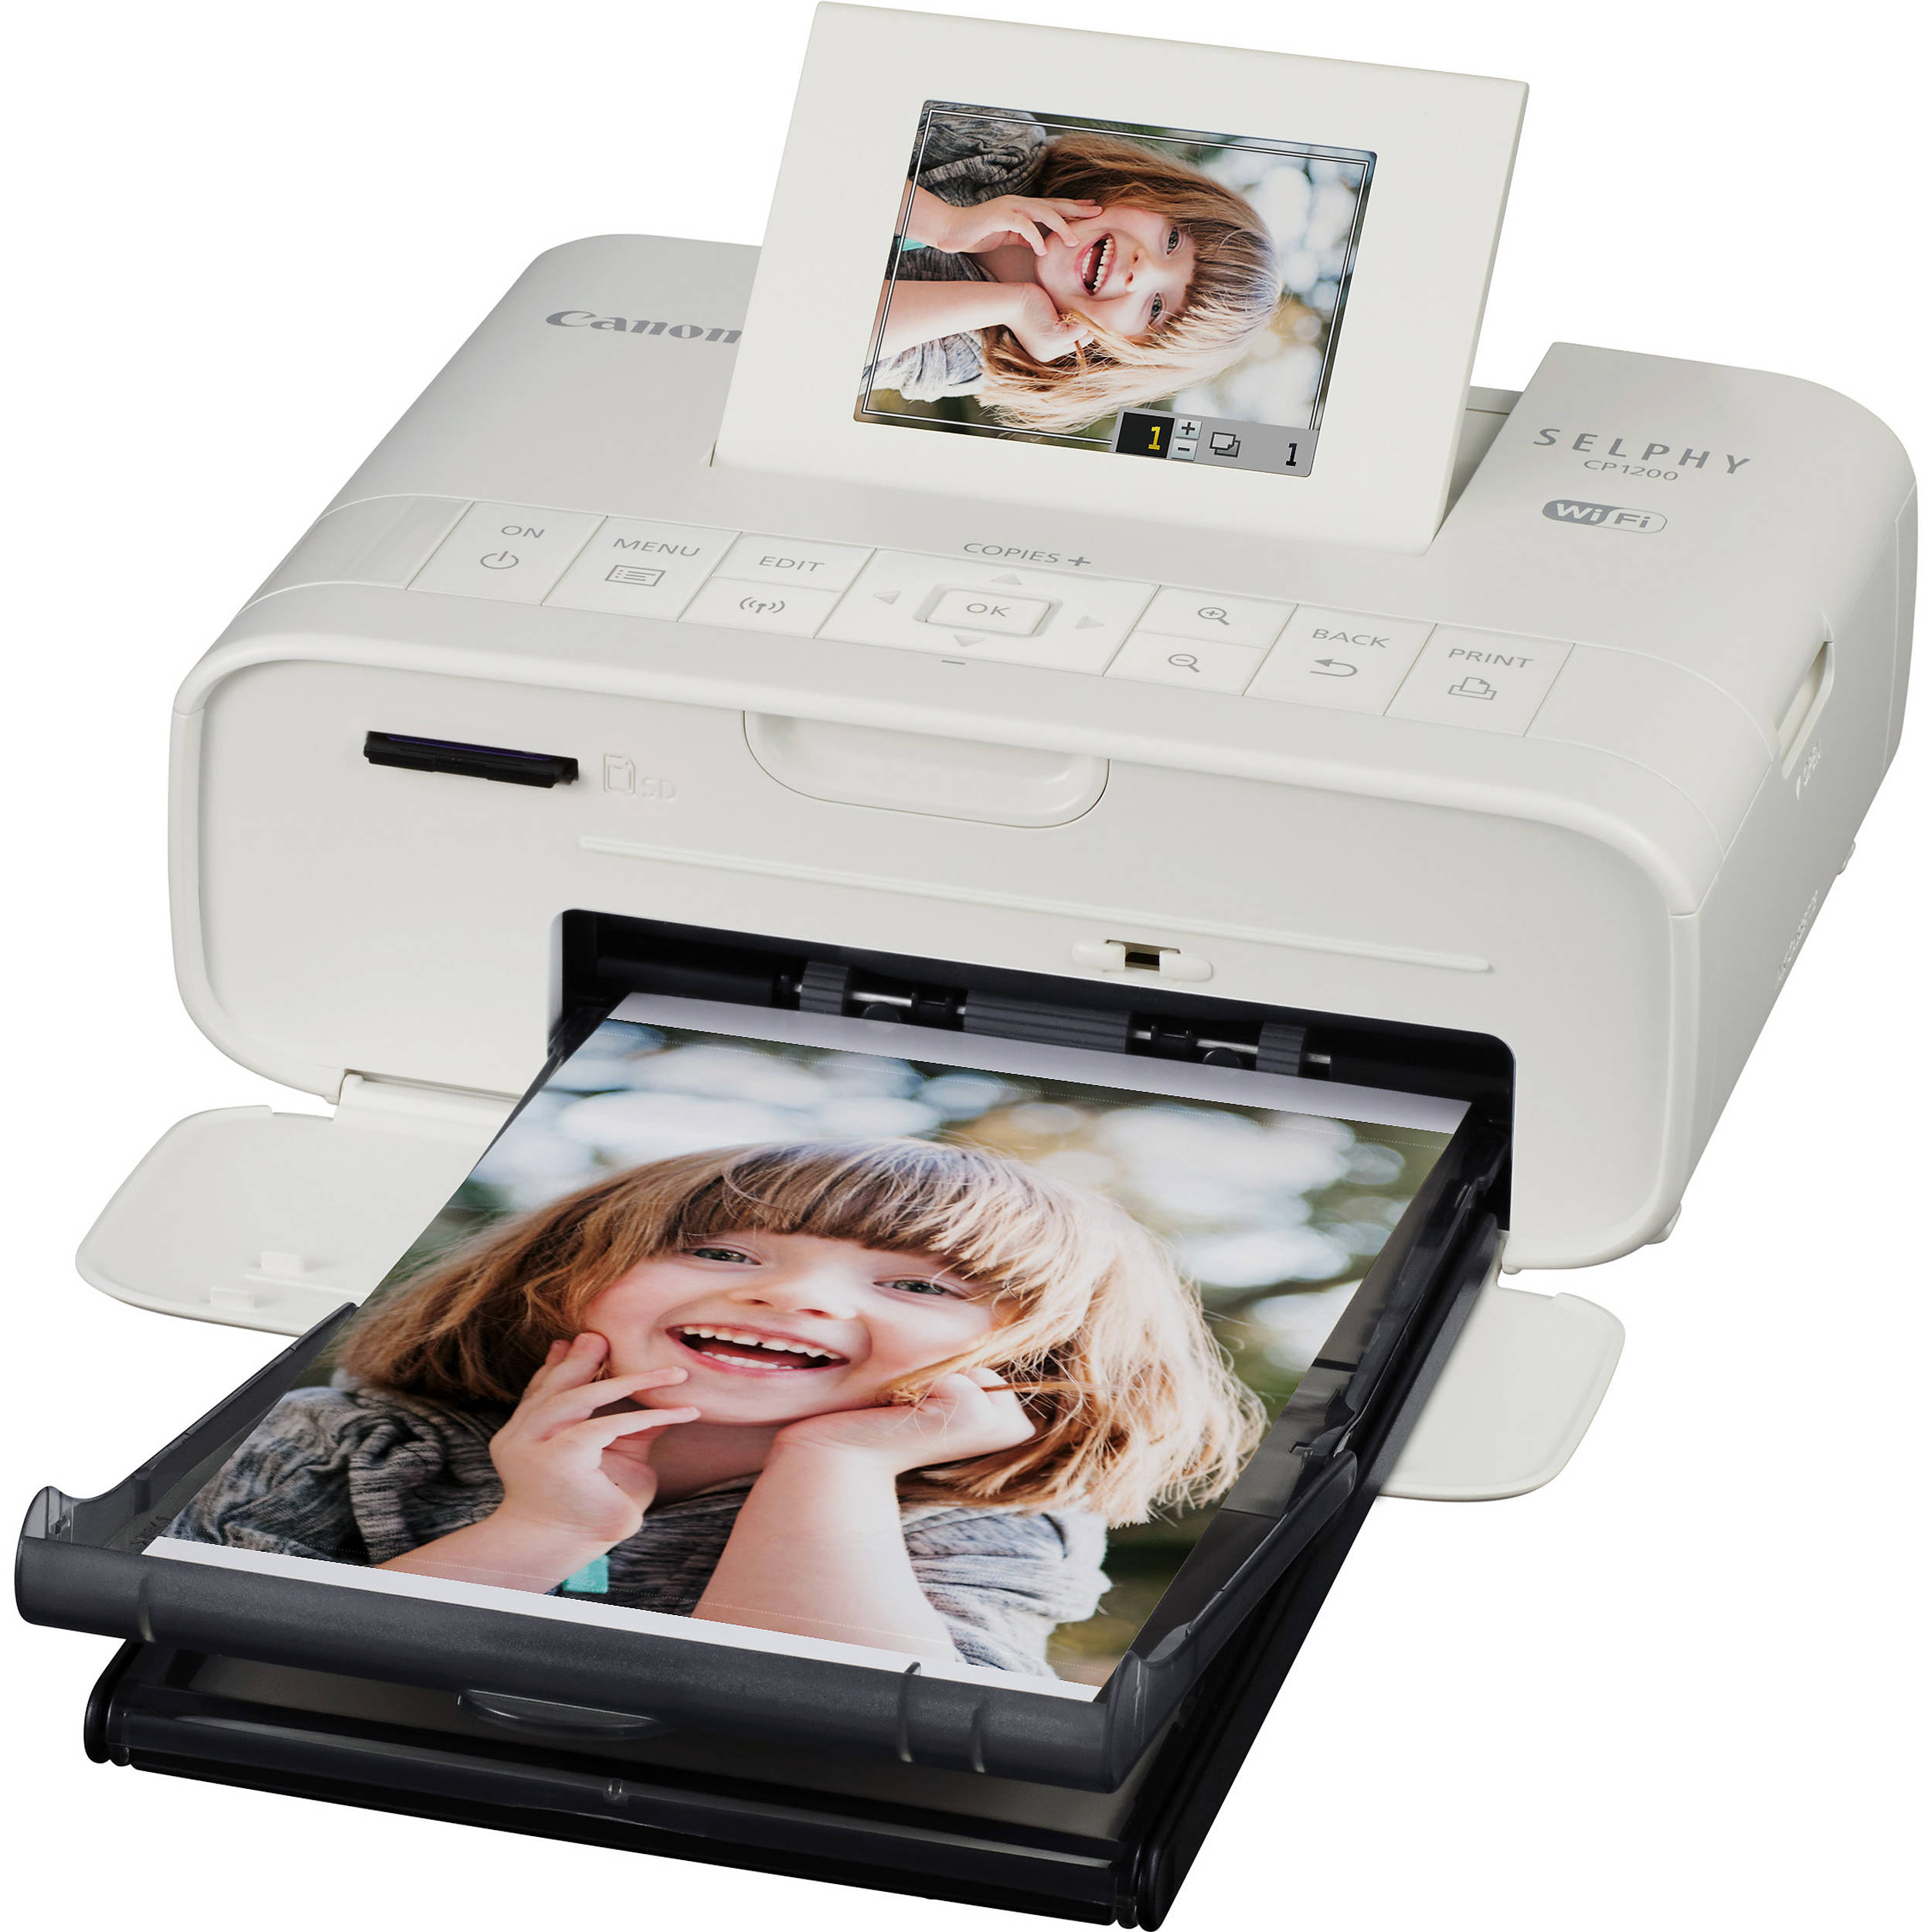 Image result for selphy printer